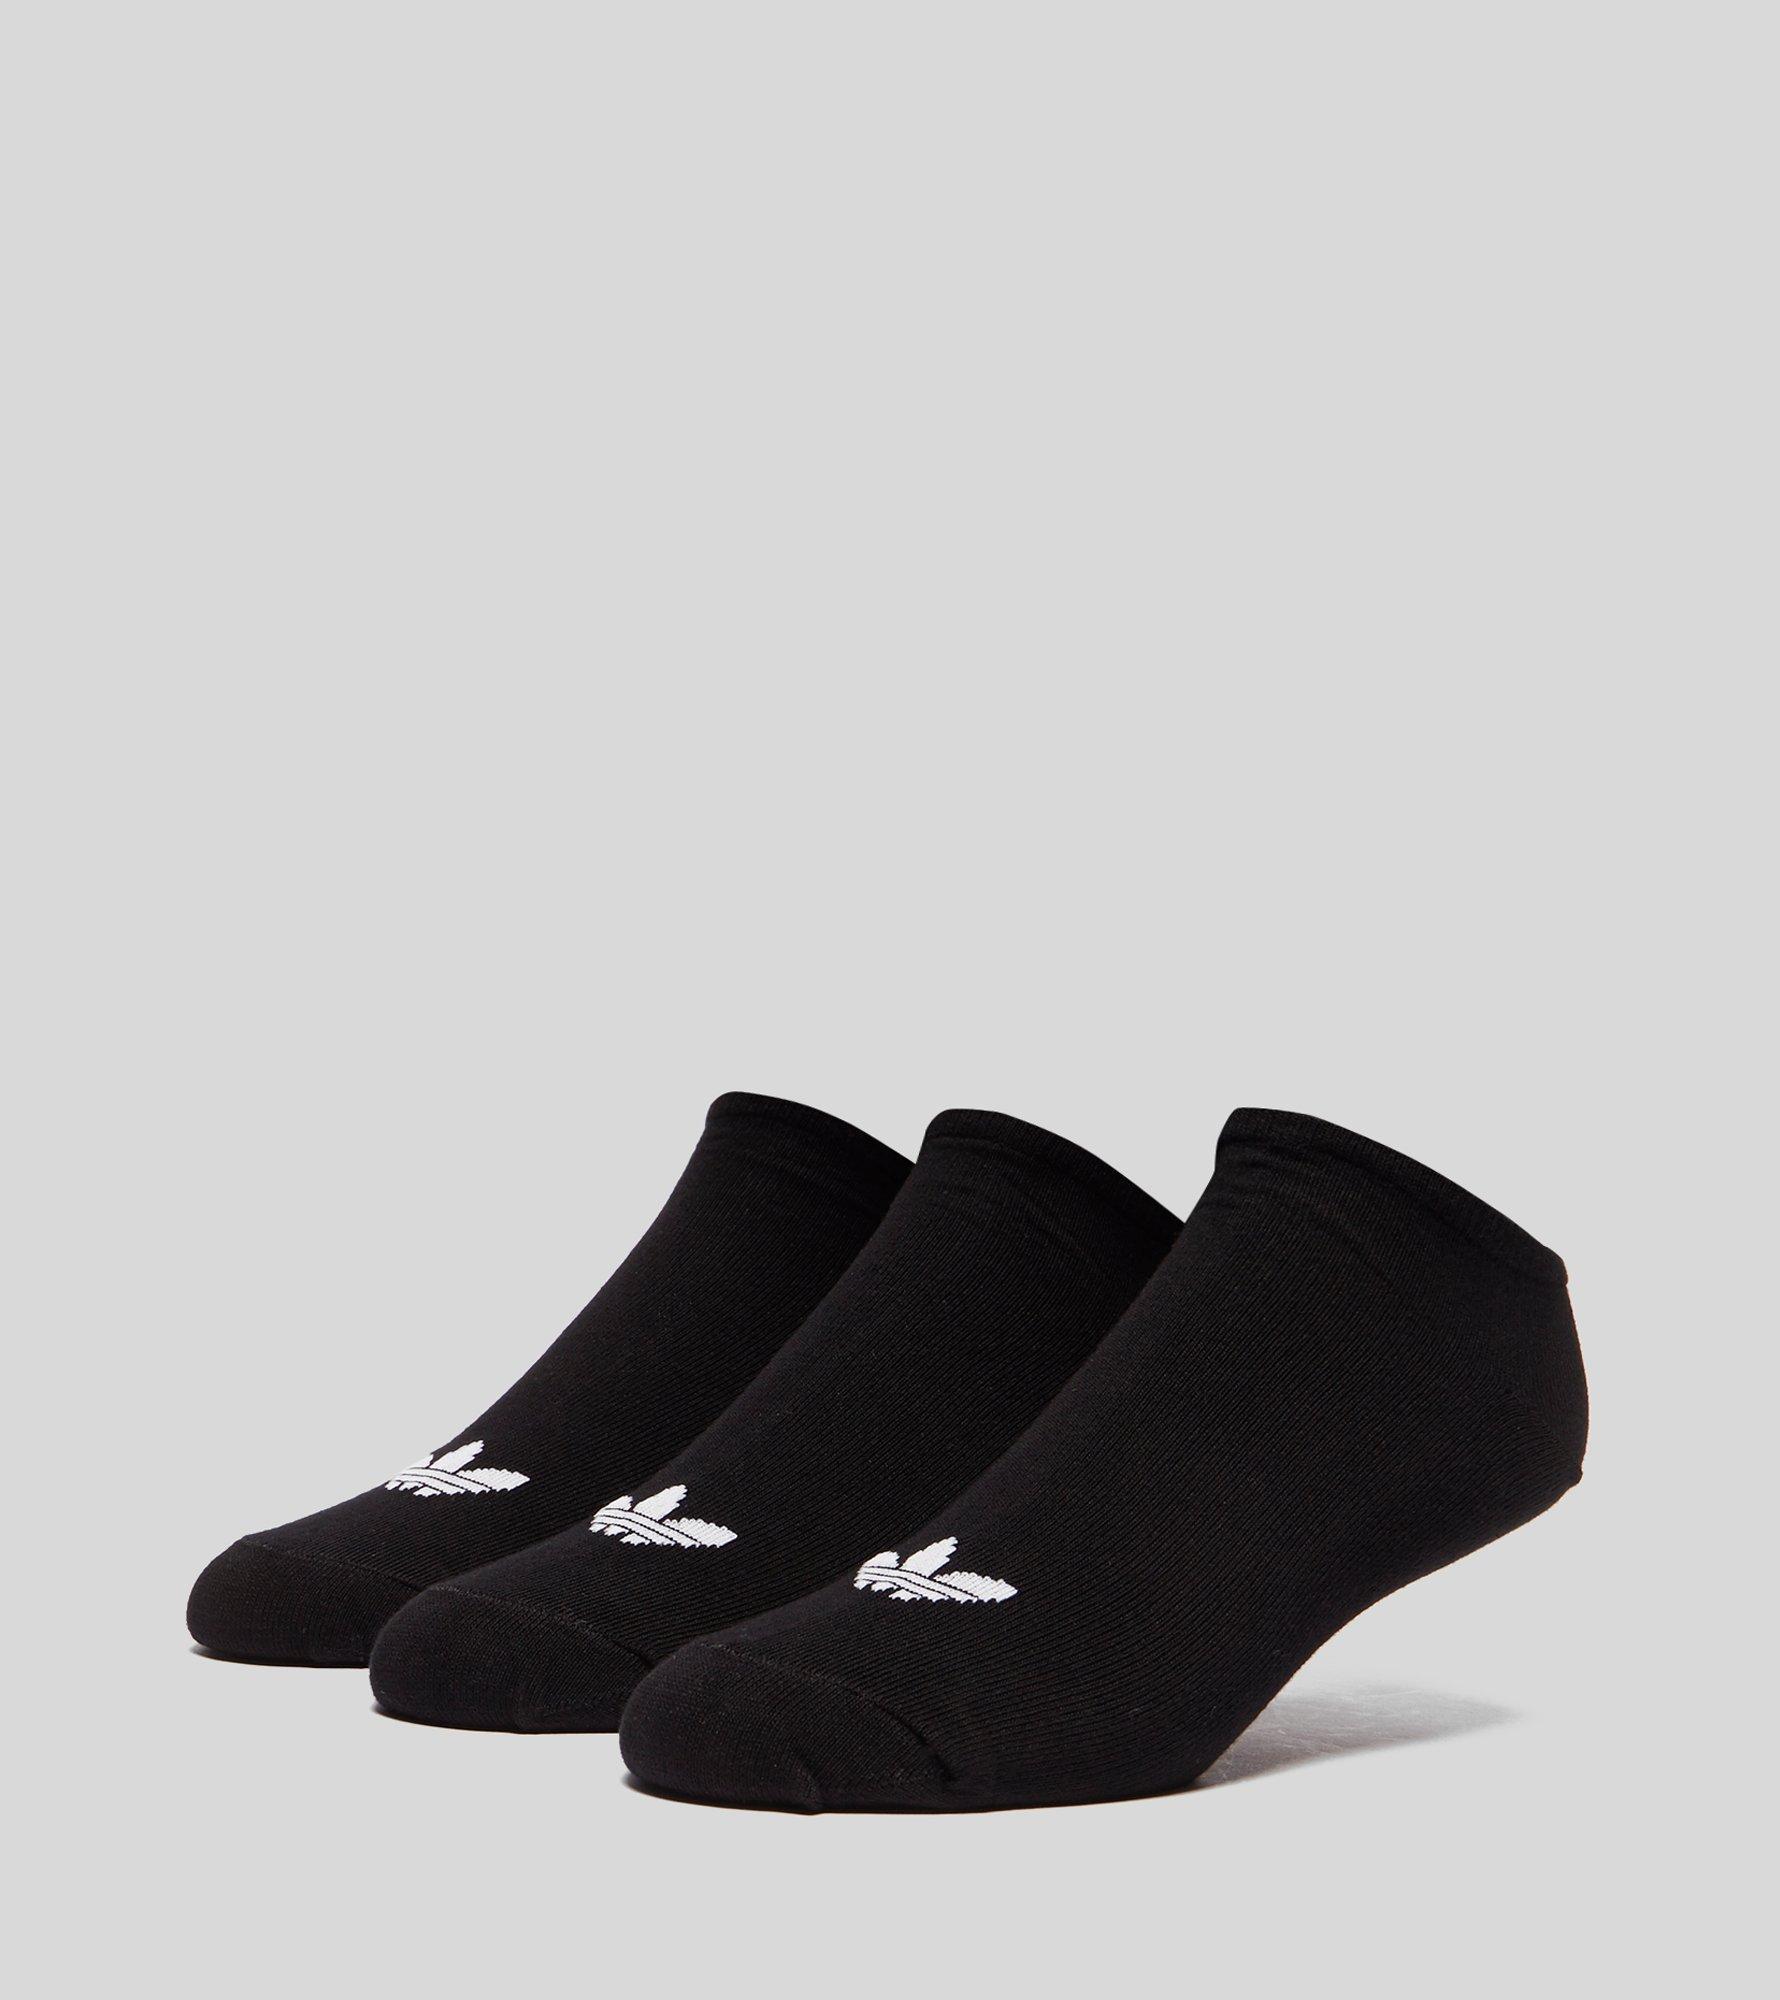 c16f02a5c Lyst - adidas Originals Trefoil Liner Socks - 3 Pack in Black